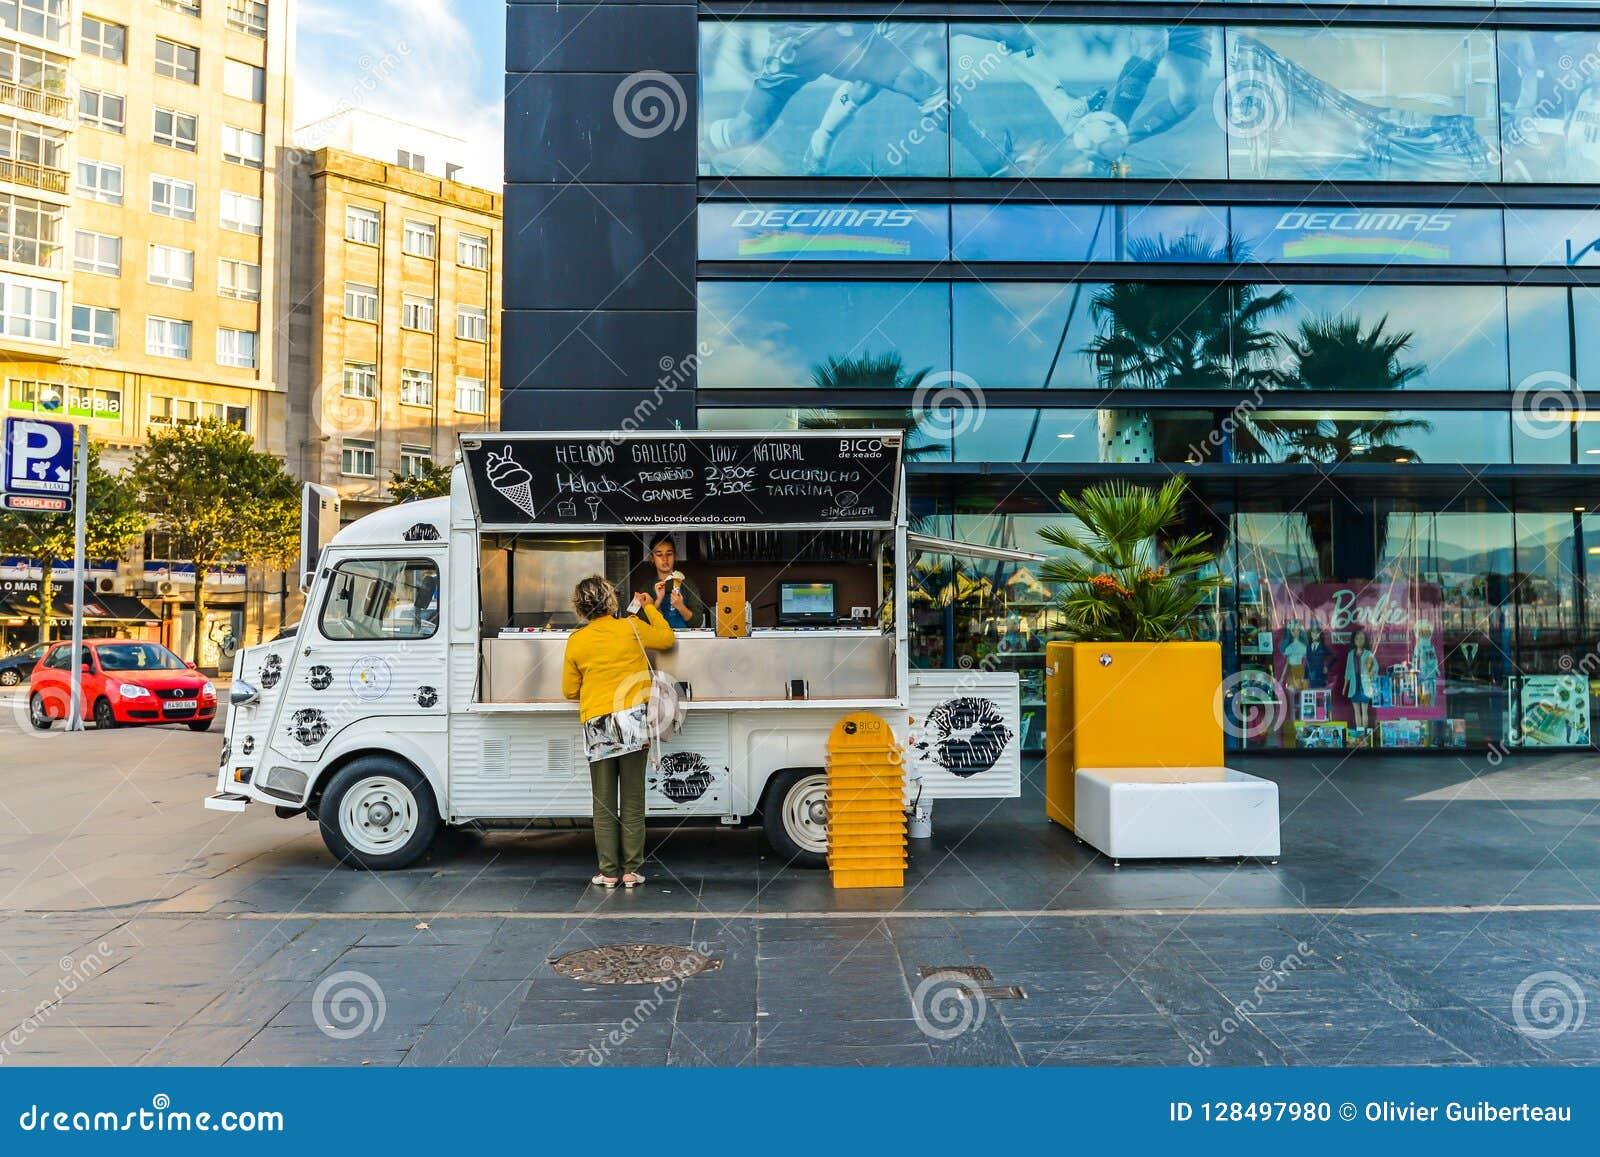 a4b84f14a2 Vigo - Galicia Spain - 10 5 18 - An ice cream truck outside a shopping  center